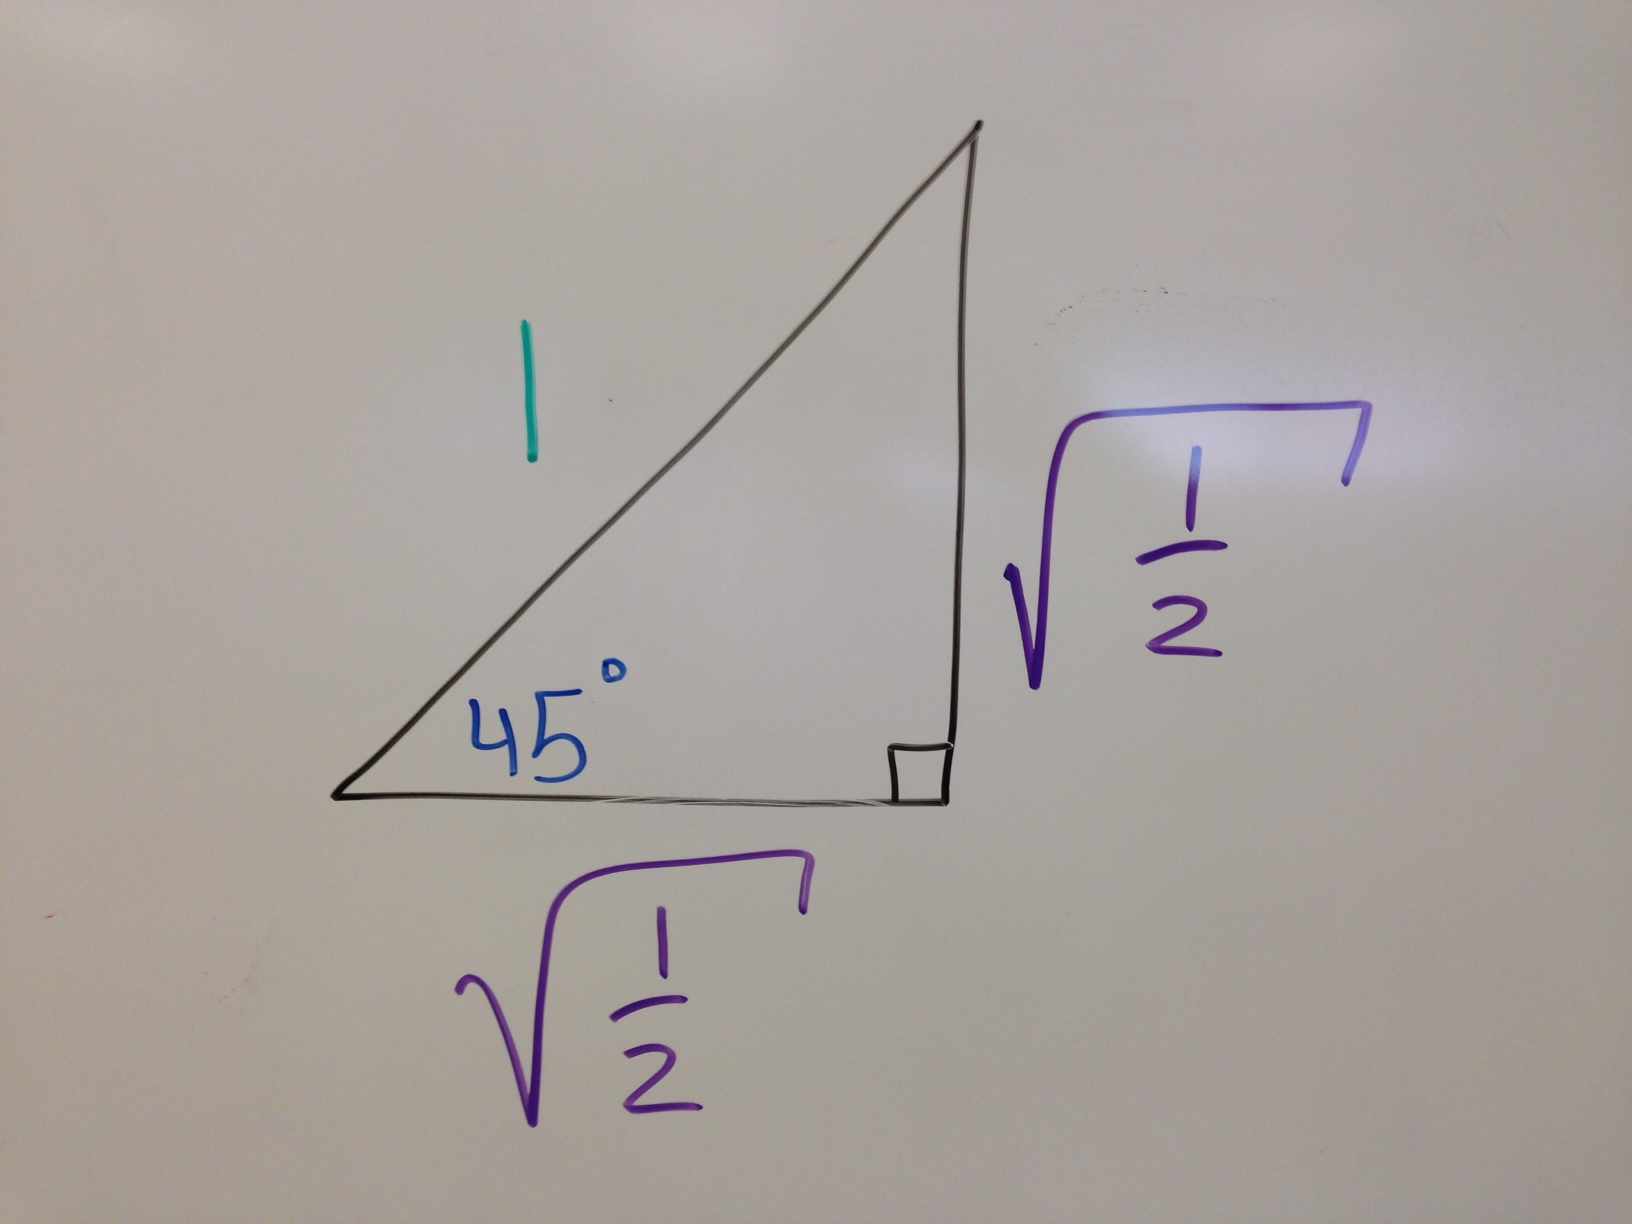 Trigonometry Trig Values Special Right Triangles 45 45